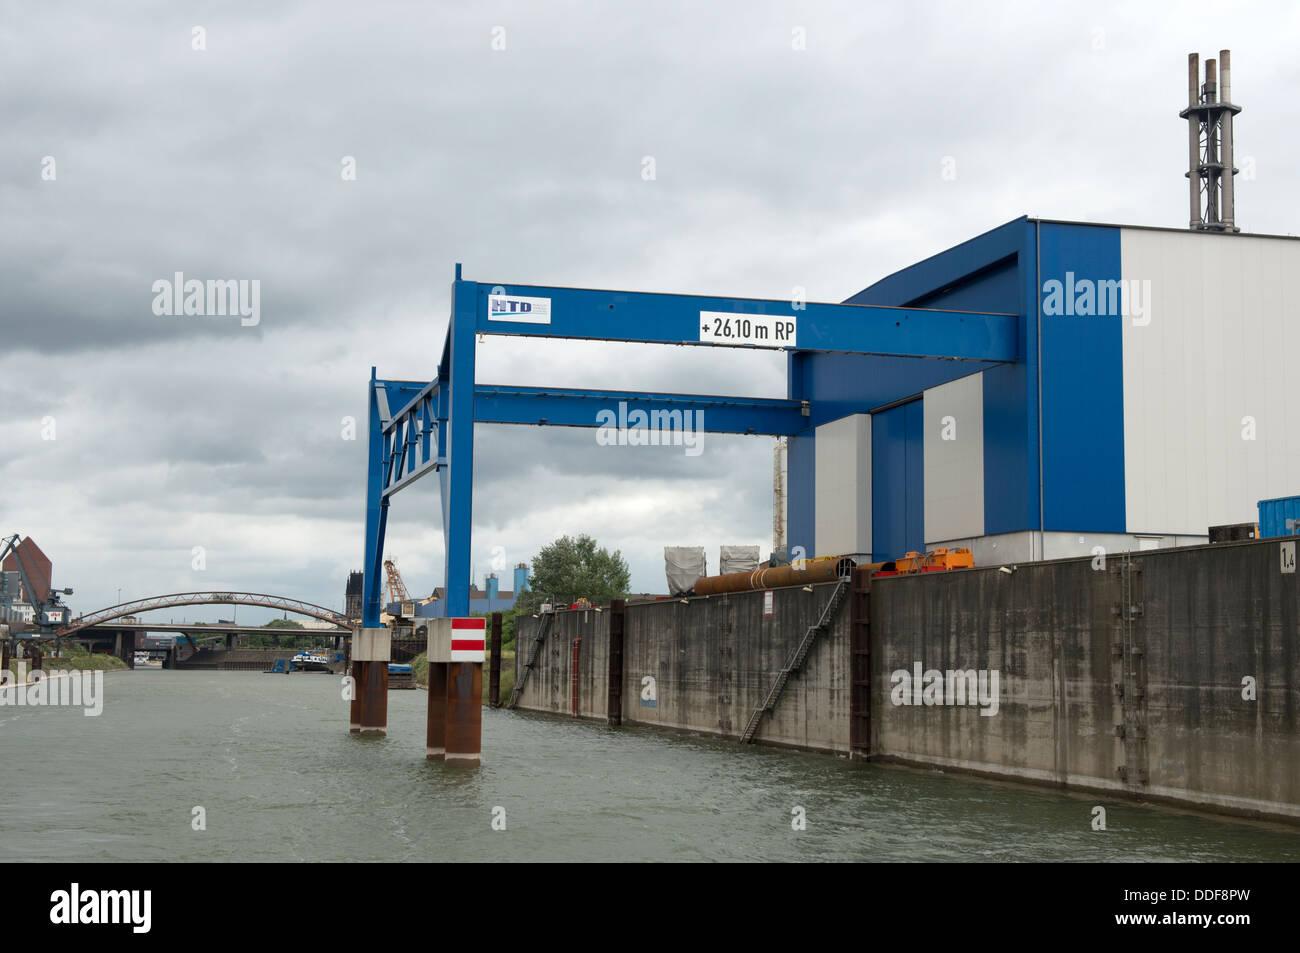 Heavy Lift Terminal (HLT) Duisburg, Germany. - Stock Image